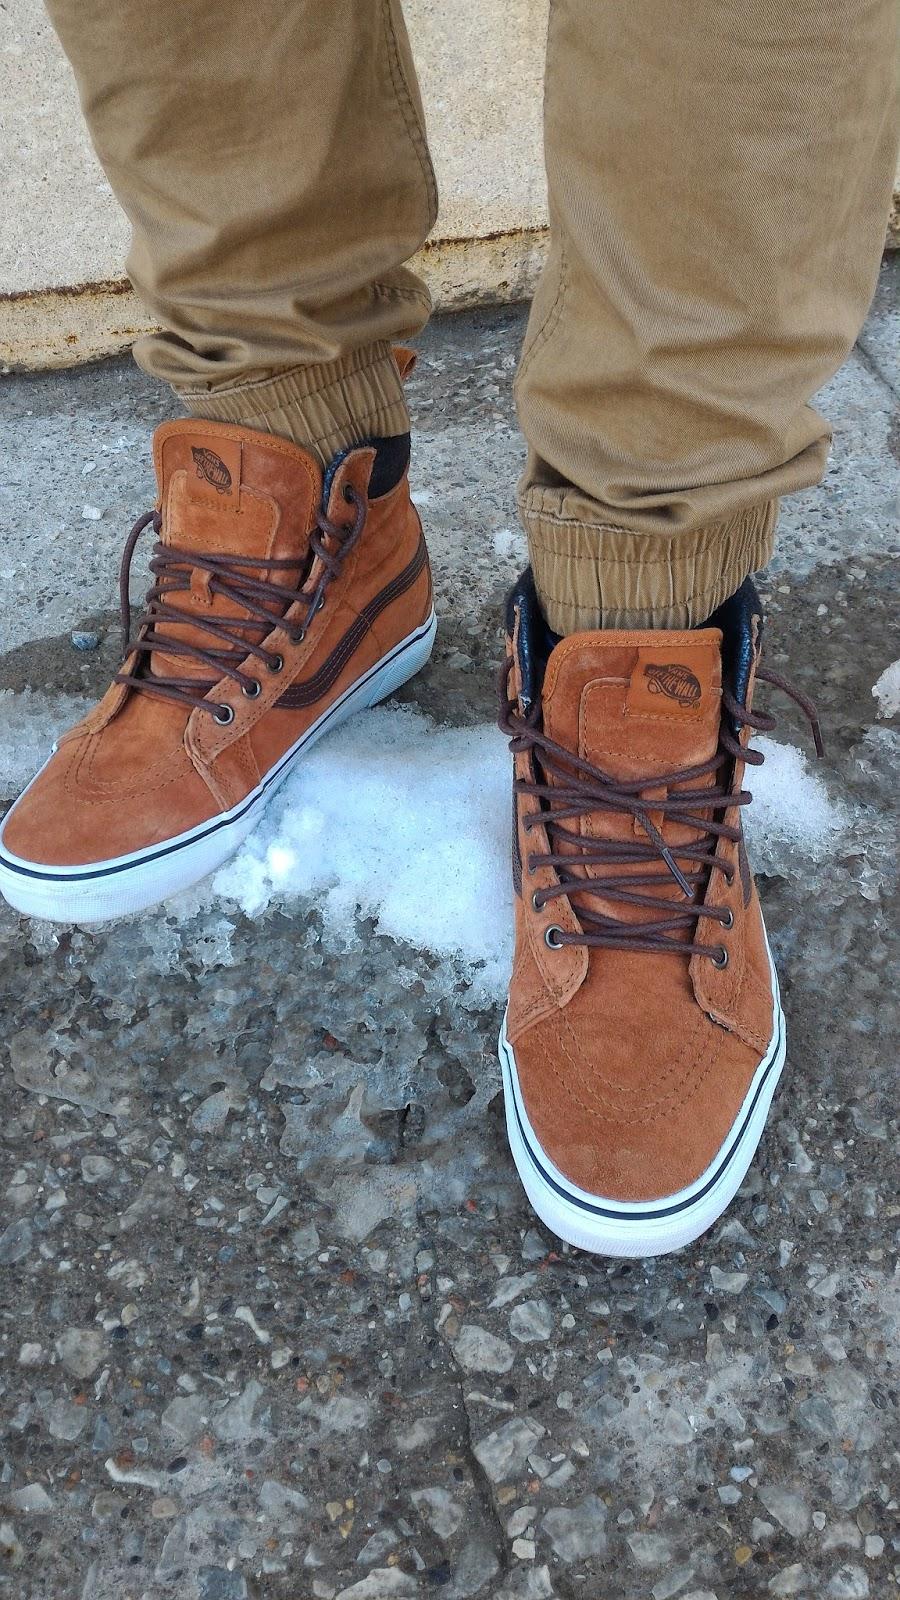 70f25a18bd Jacket - Vans Kilroy MTE Sweater - Vans Joggers - Express Men